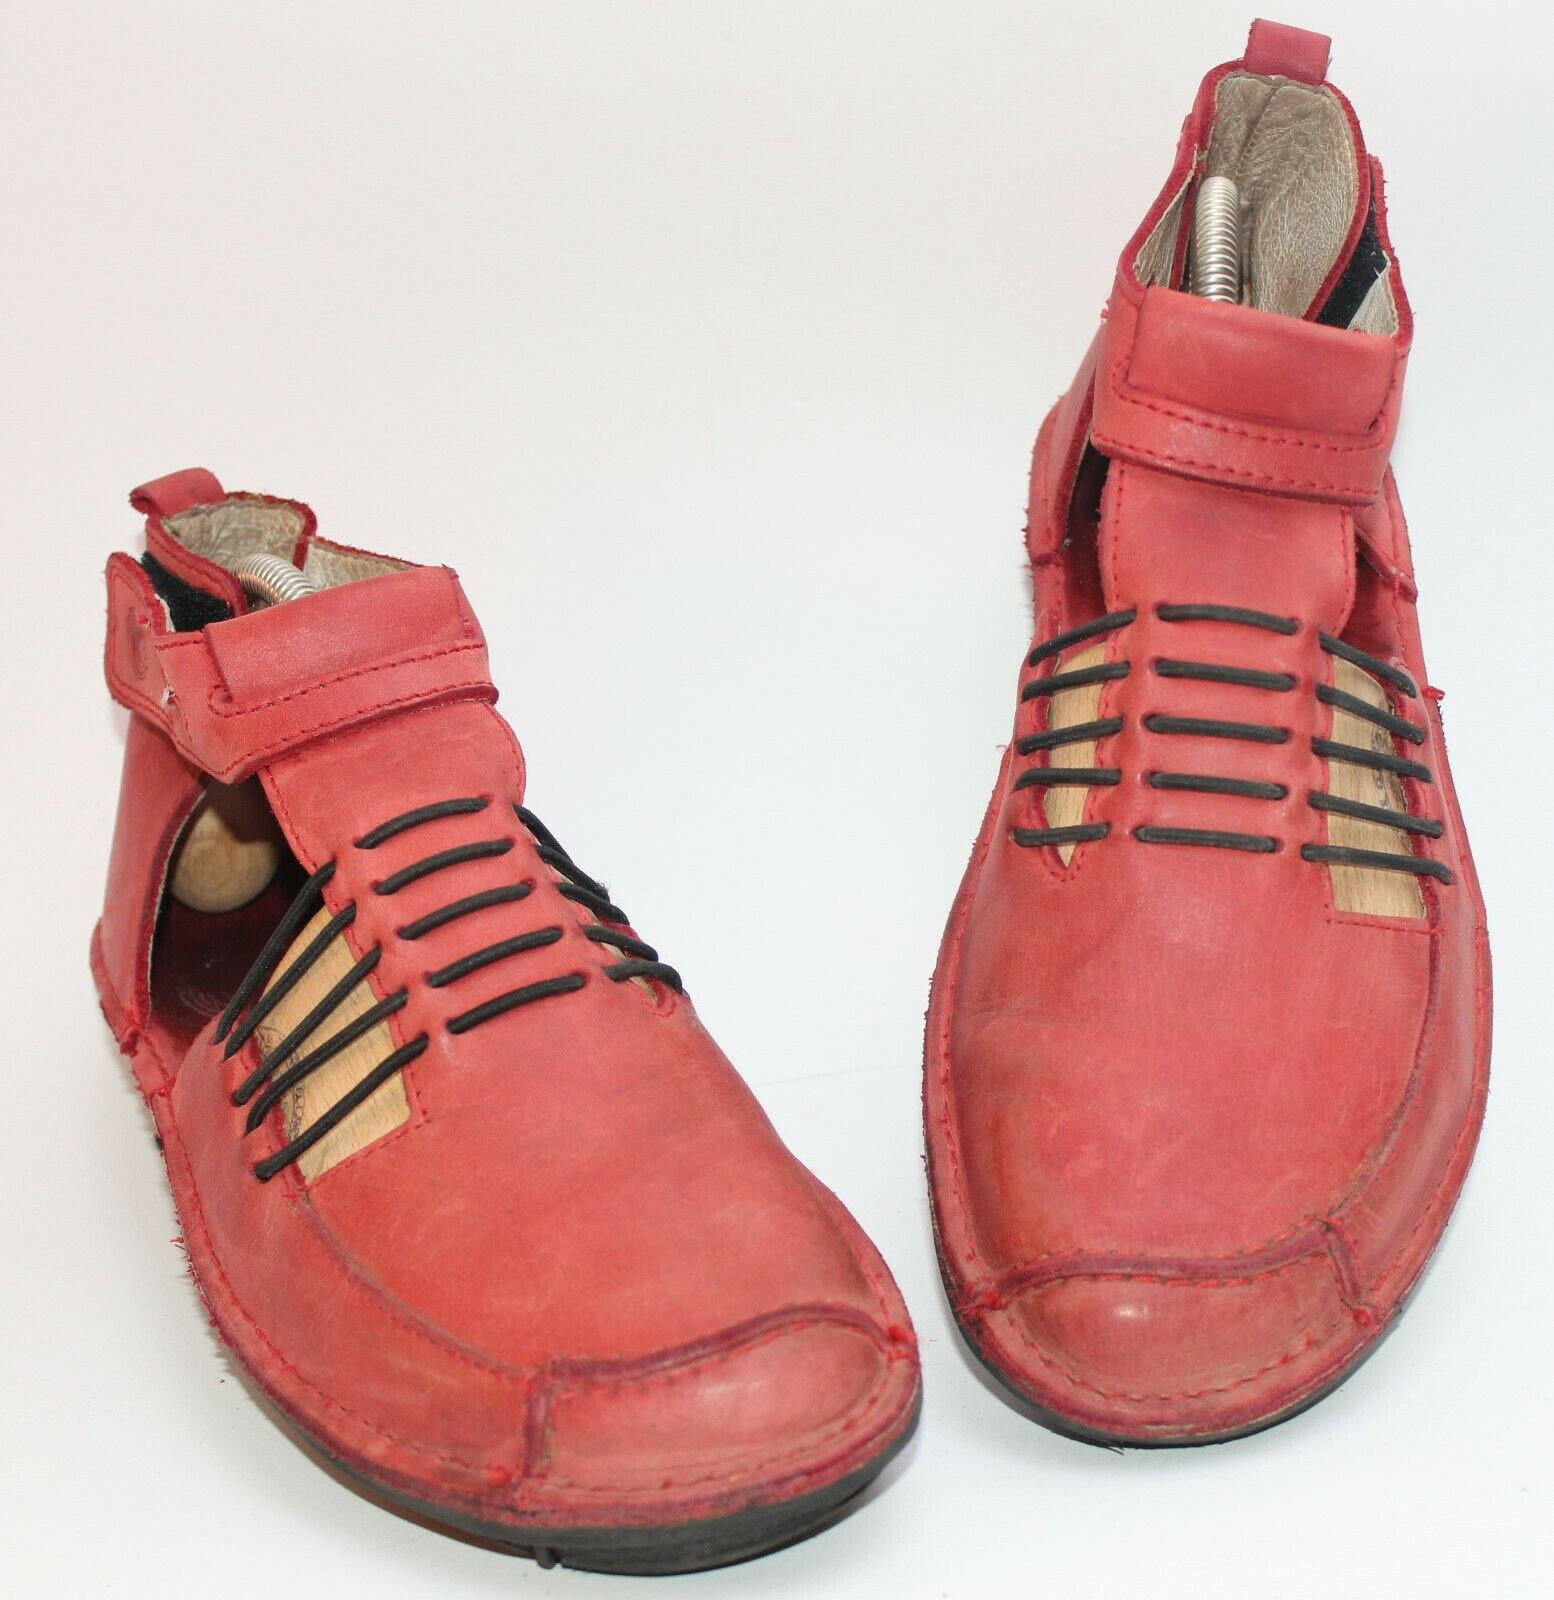 DKODE Sommer-Stiefelette Damen Ankle Stiefel Stiefelies Gr. 39 ROT-Schwarz  Leder